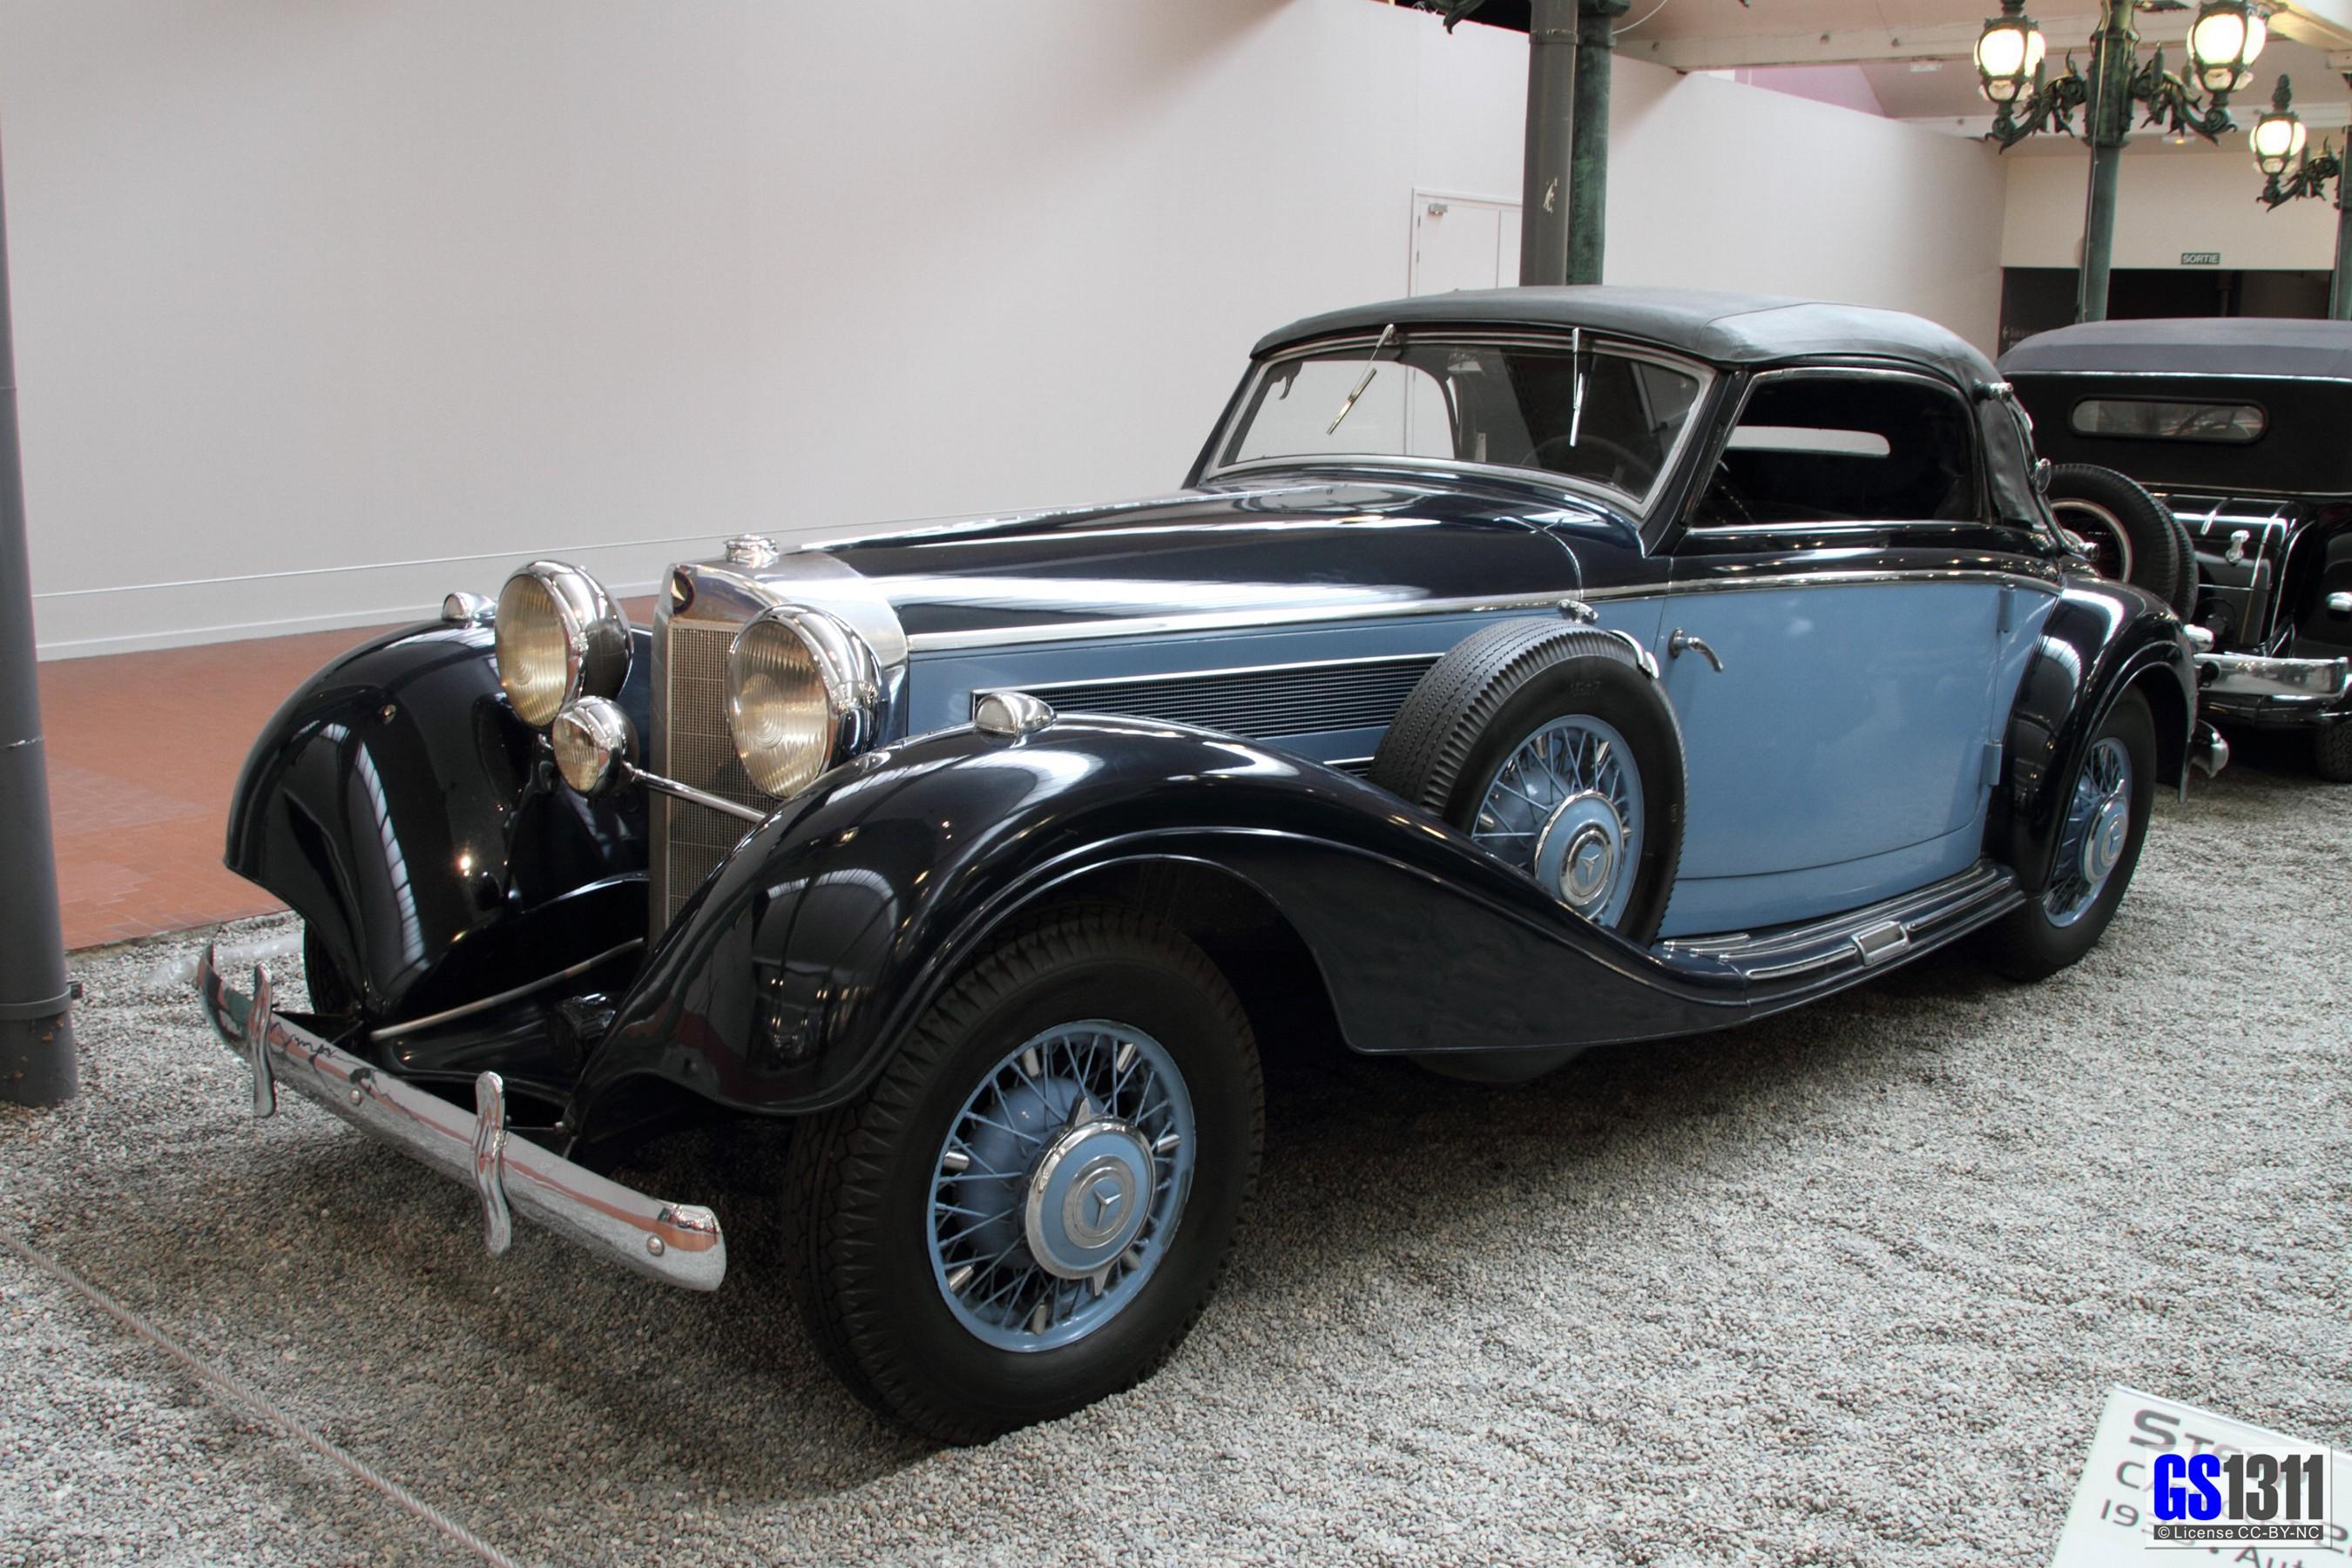 1936 1939 Mercedes Benz W 29 540 K Cabriolet Flickr